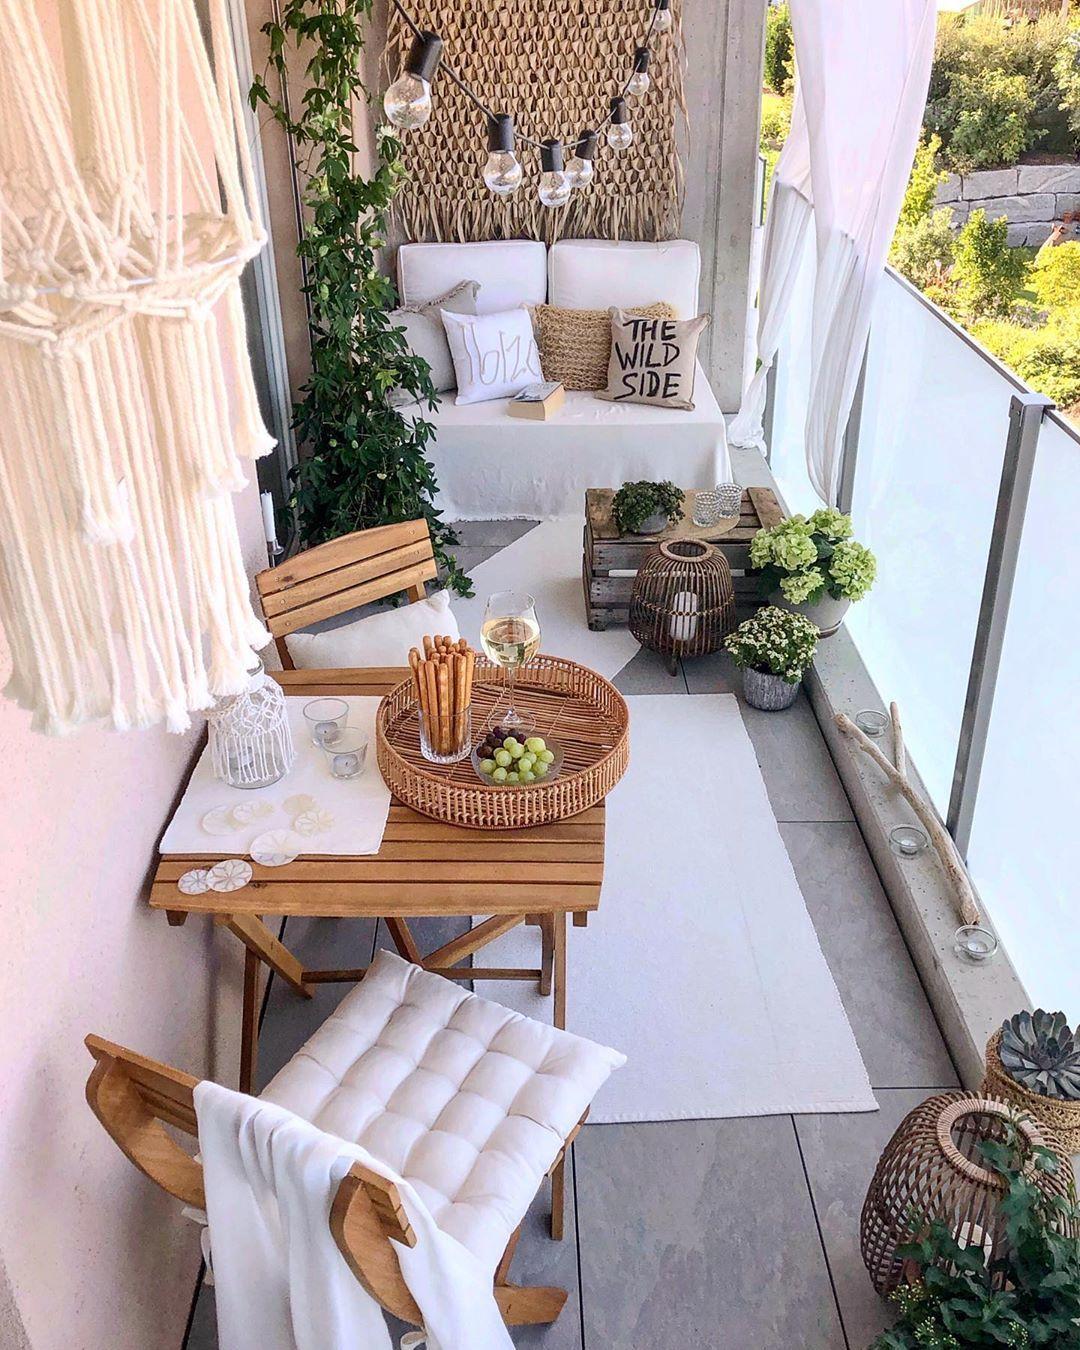 Off White Color Tips For Using 70 Environments To Inspire You Terrace Decor Small Balcony Decor Small Balcony Design